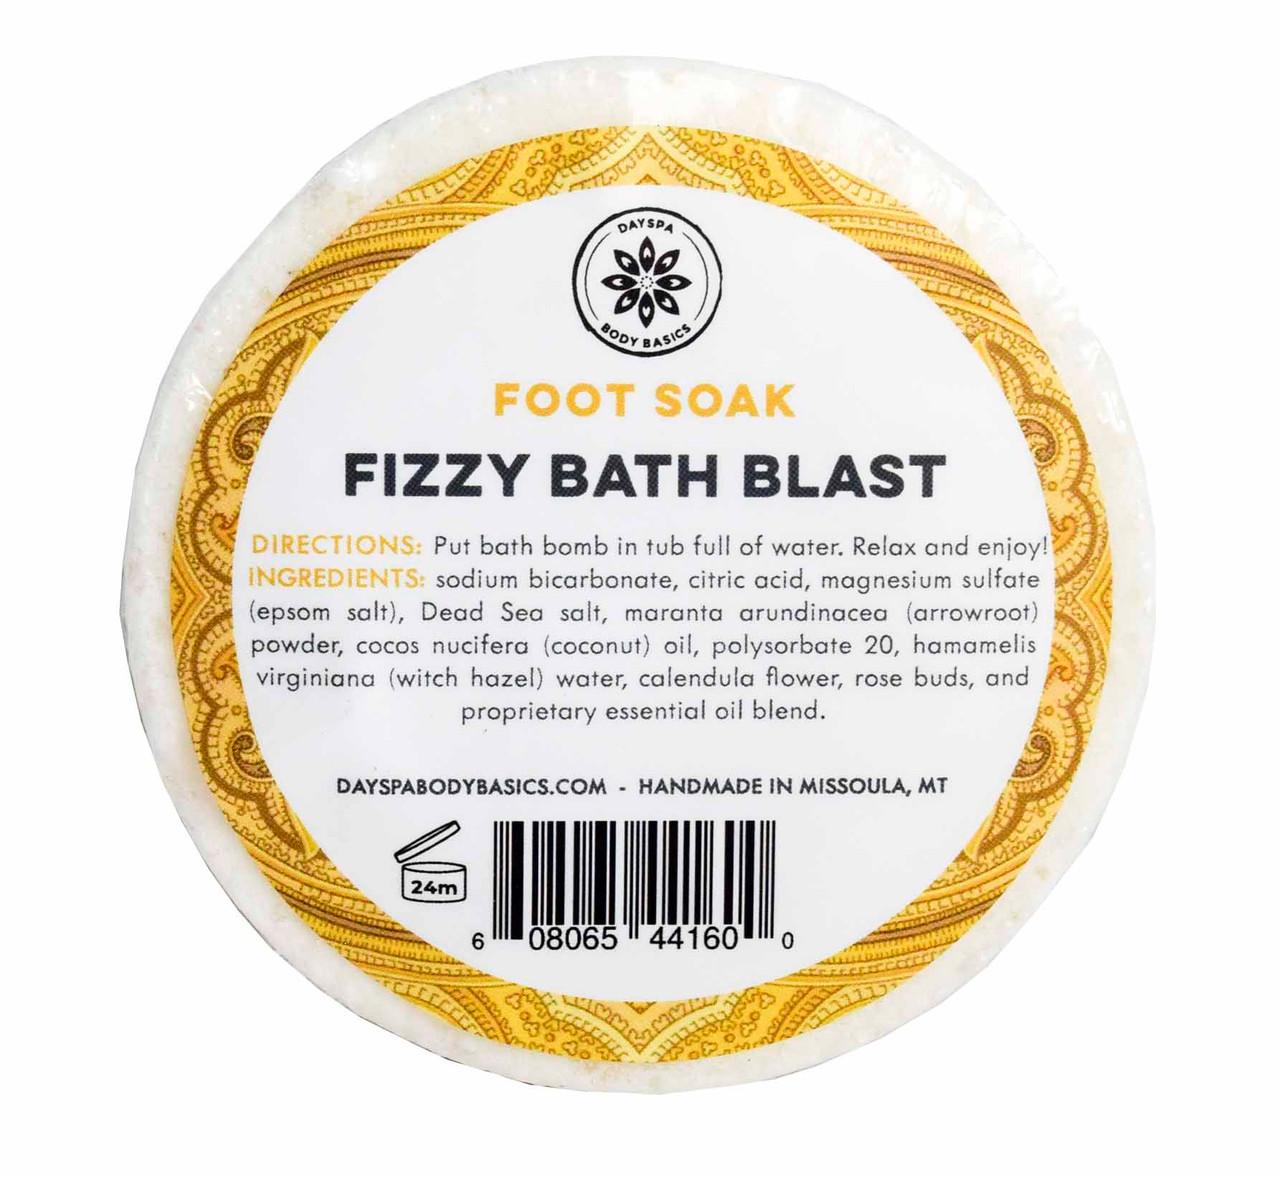 DAYSPA Body Basics Fizzy Bath Blast Foot Soak